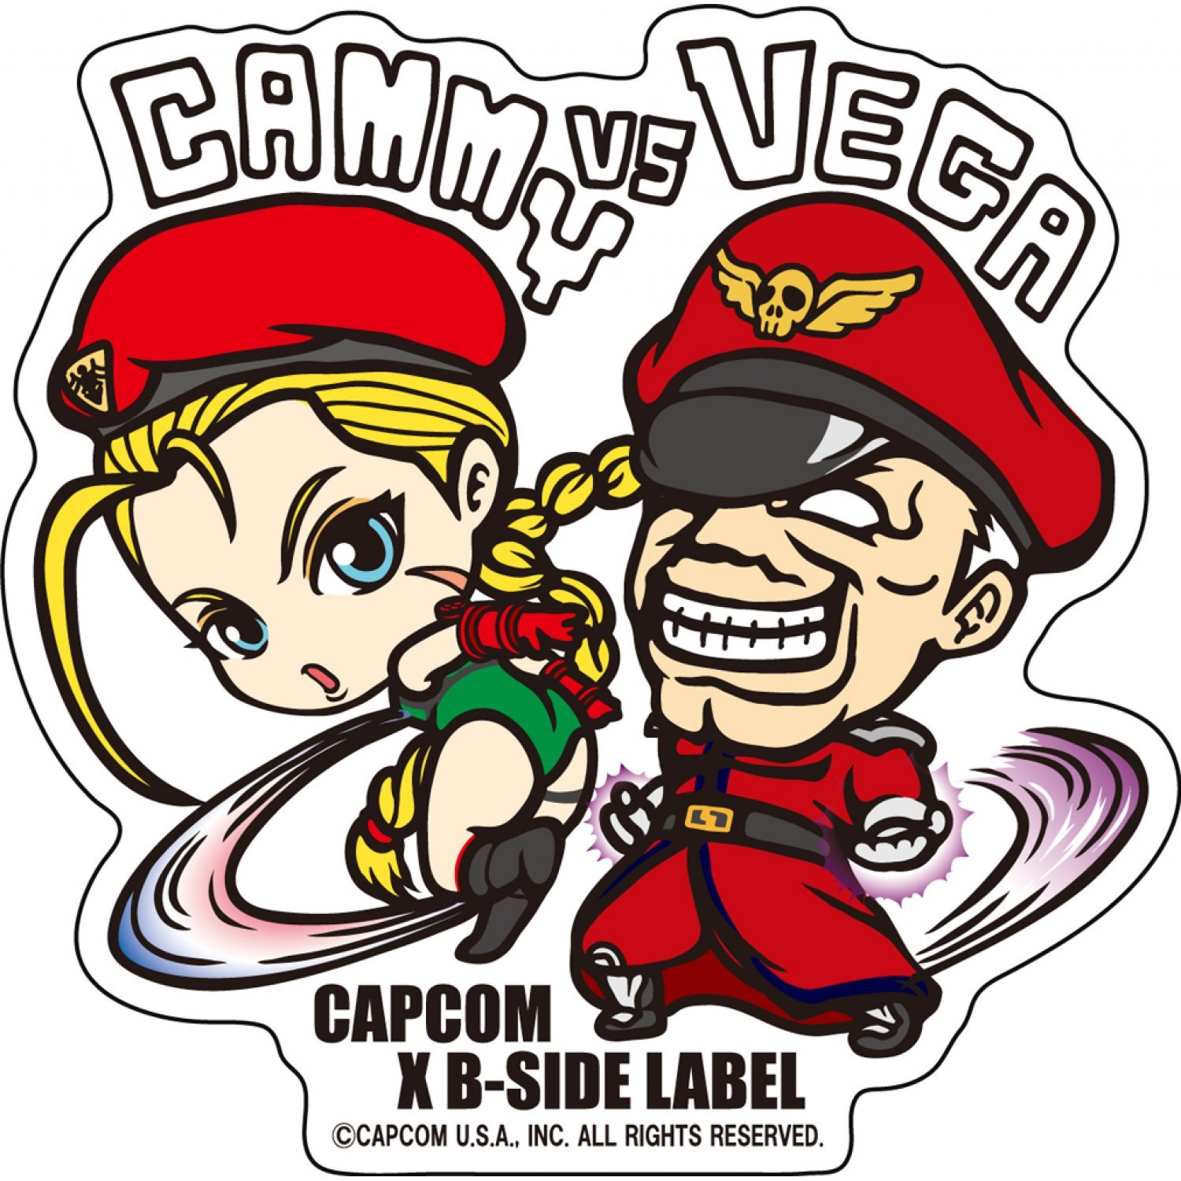 Capcom x b side label sticker l street fighter cammy vega